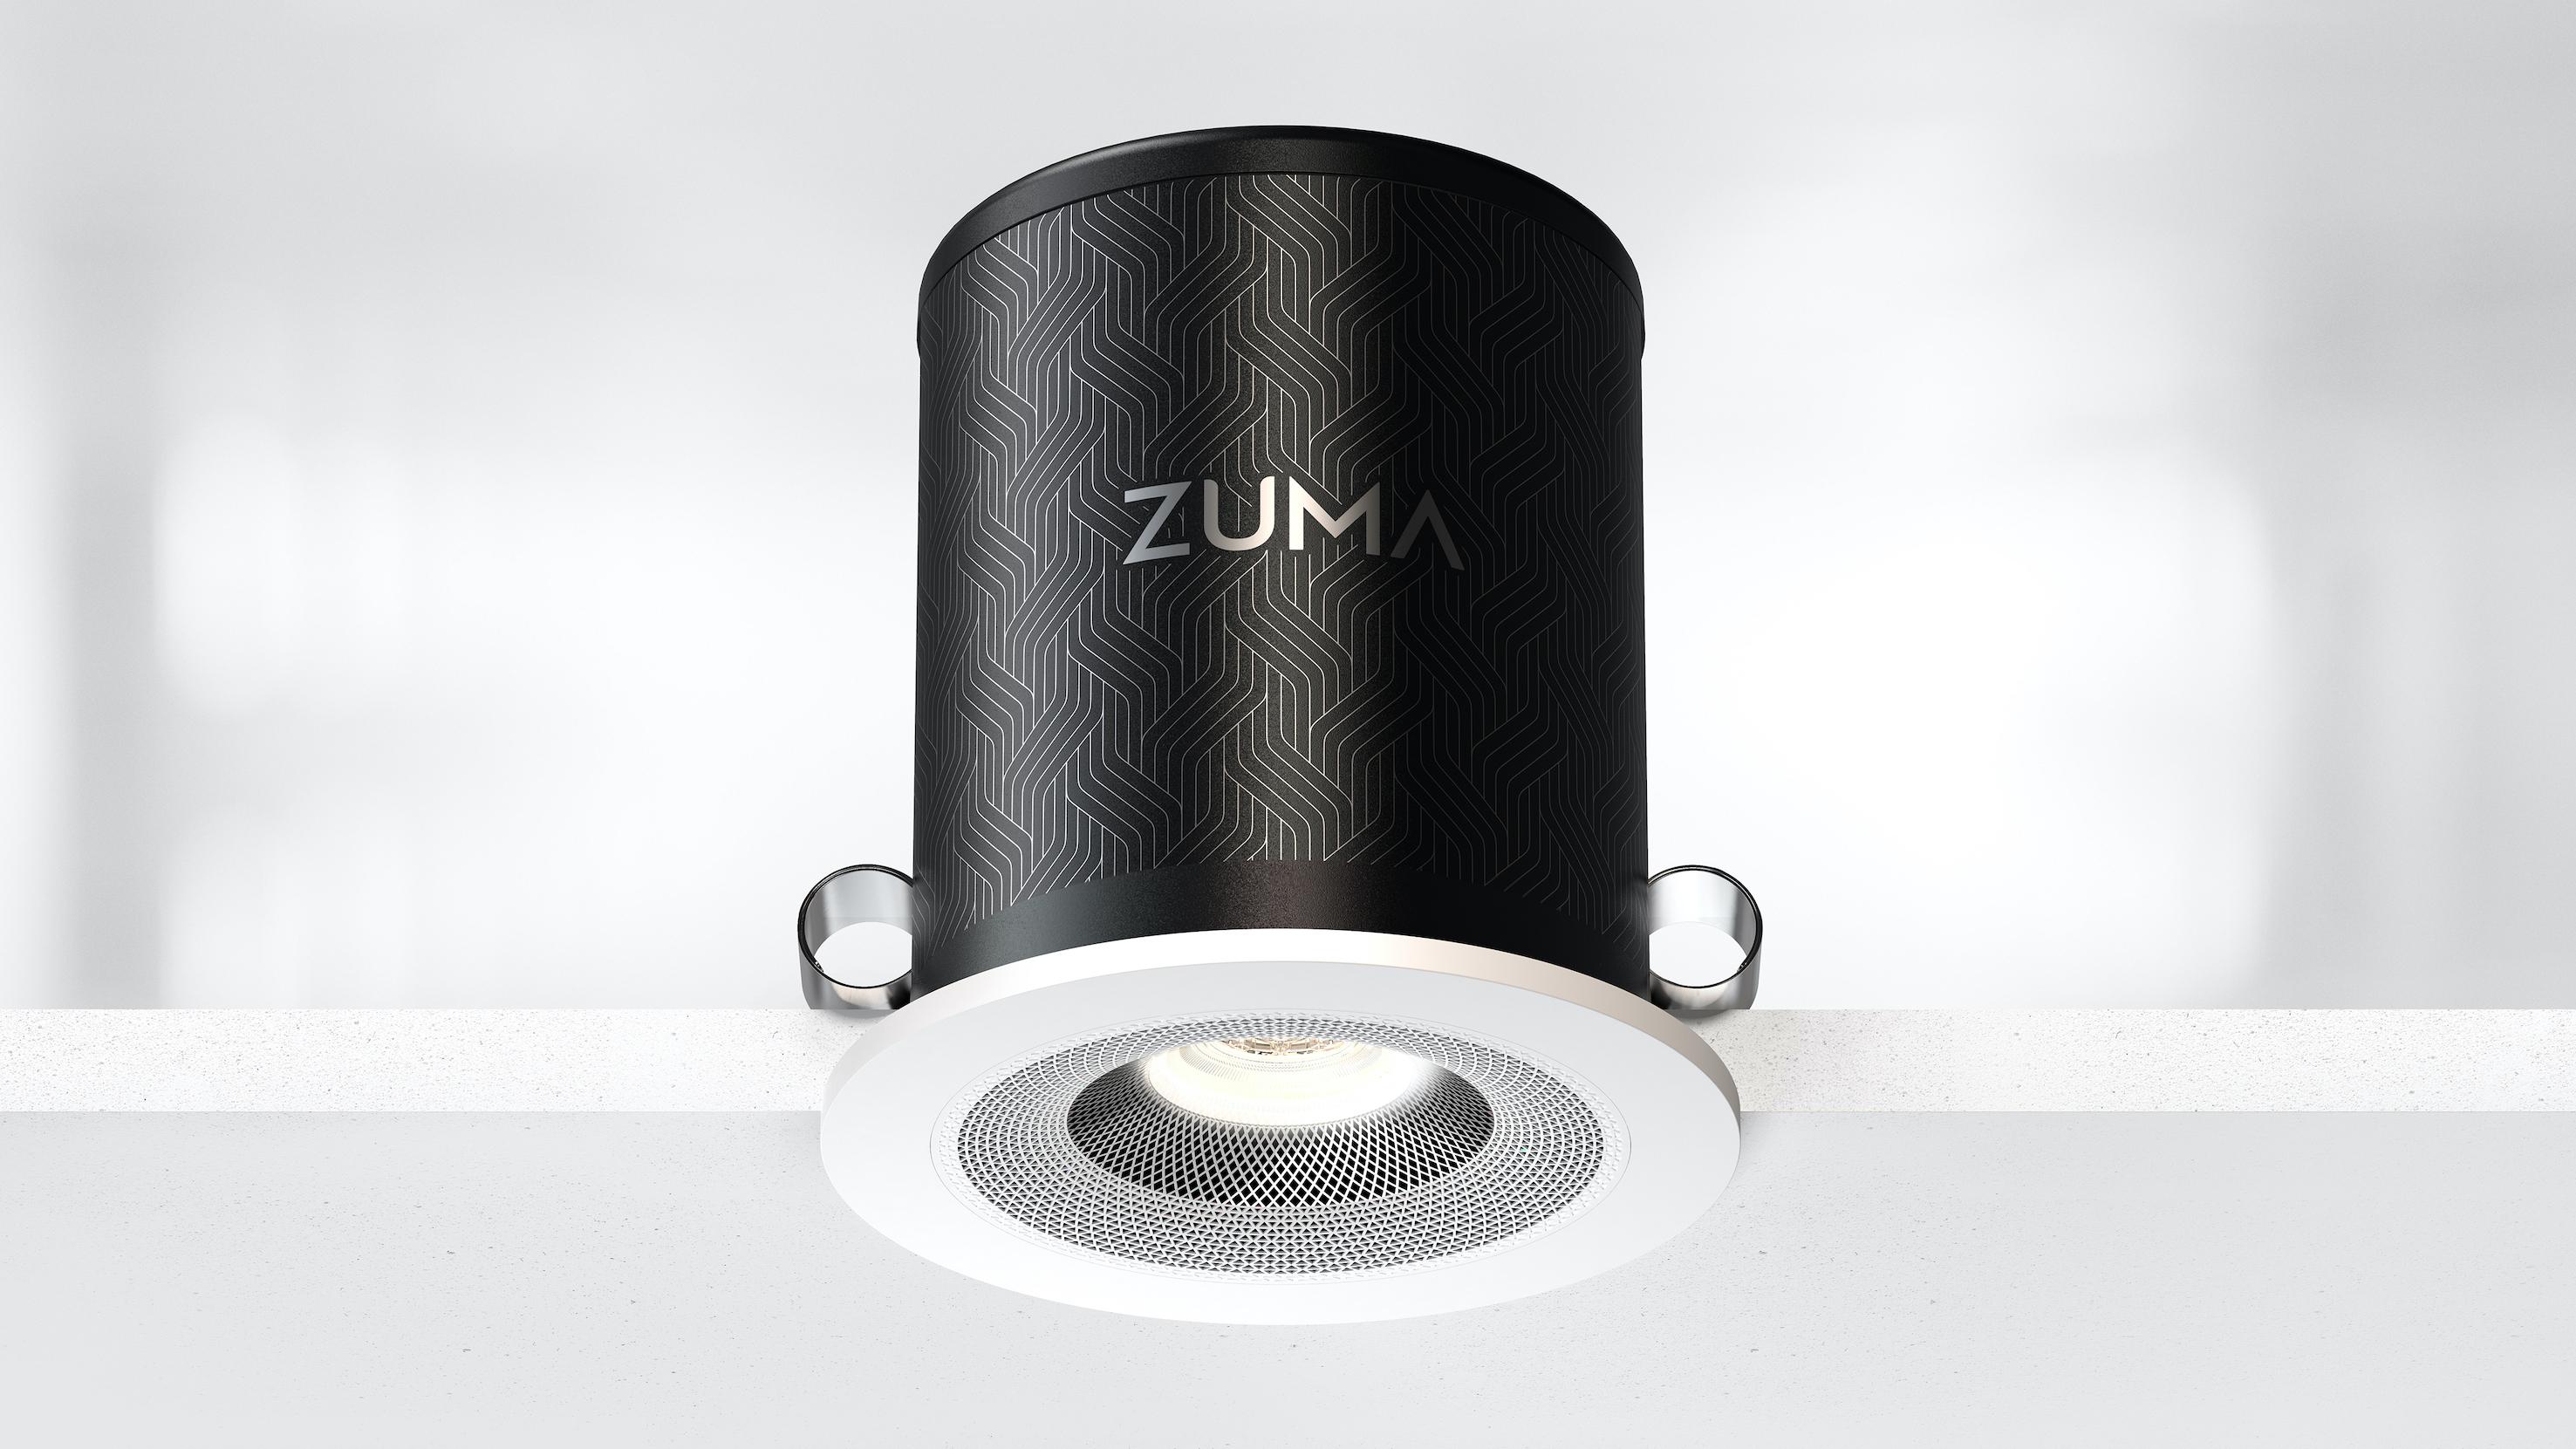 Zuma Lumisonic: an ultra-compact speaker light from the engineer of B&W's Nautilus